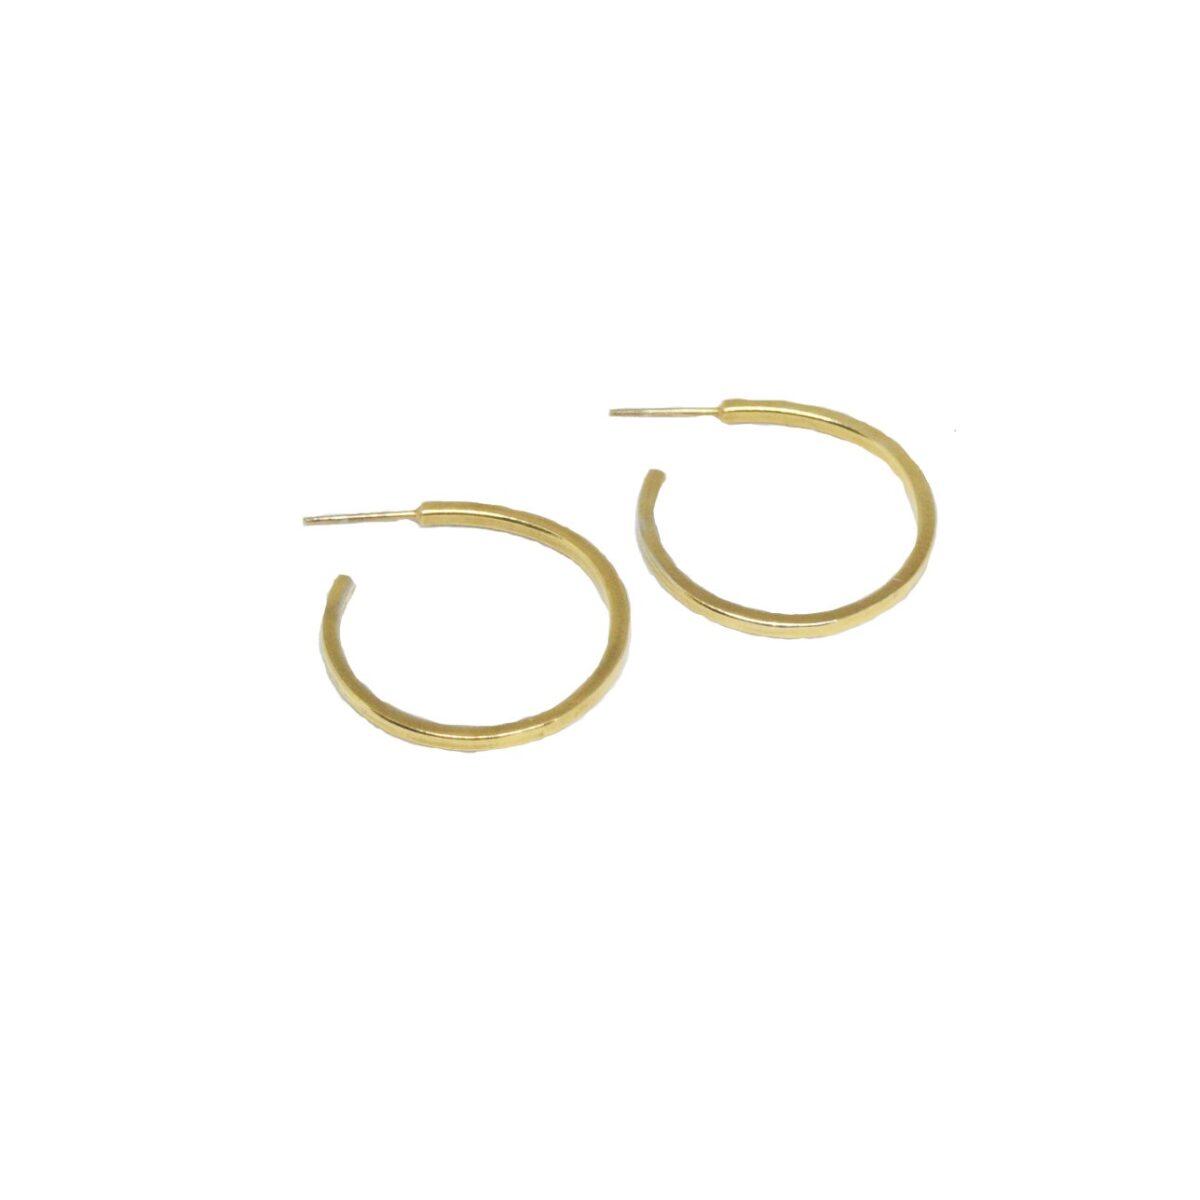 Geometry earrings C II gold plated